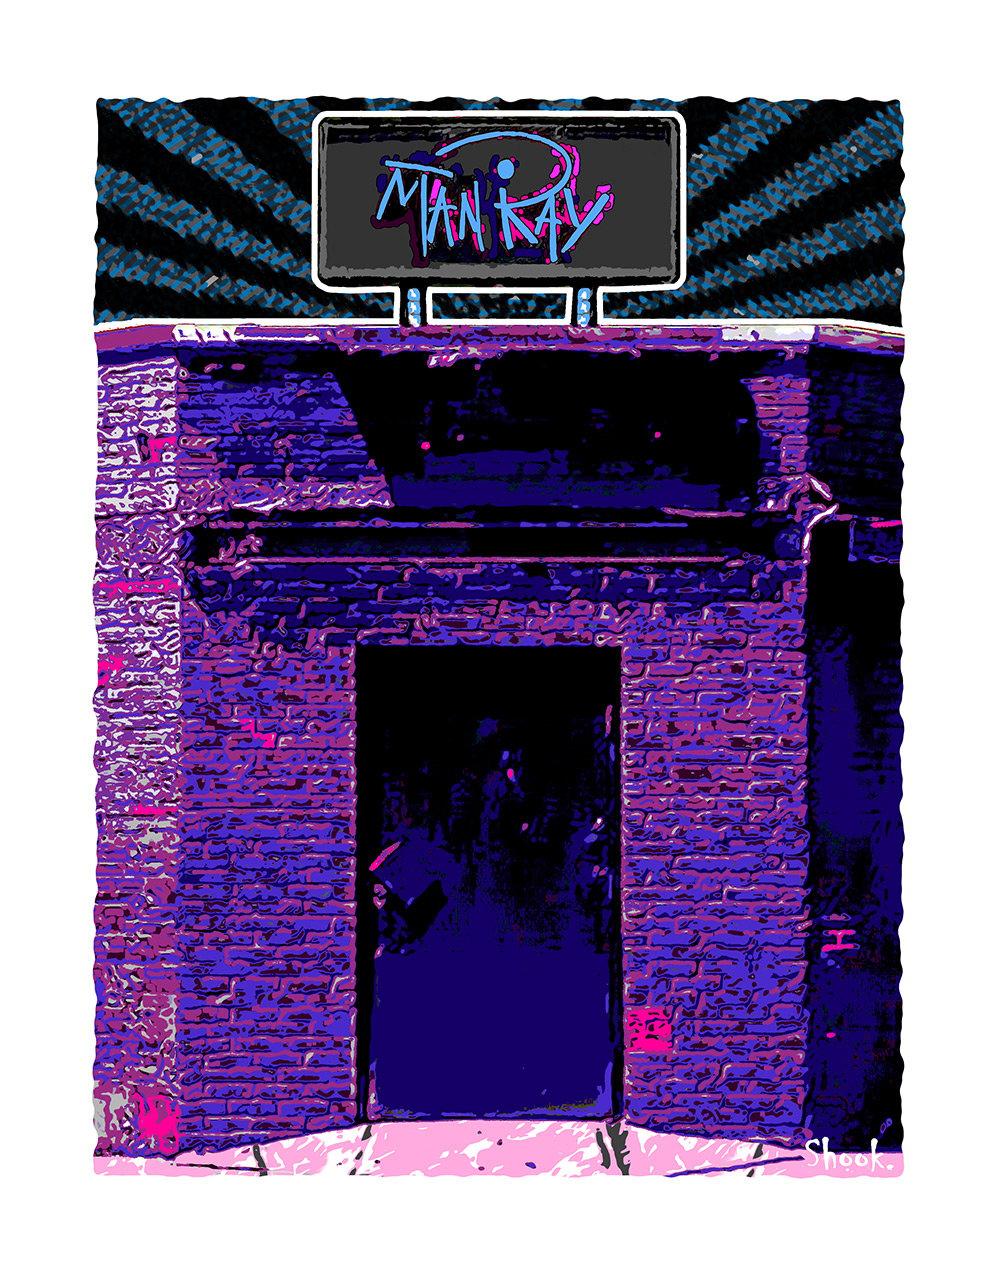 Man Ray Cambridge Giclée Art Print (Multi-size options)